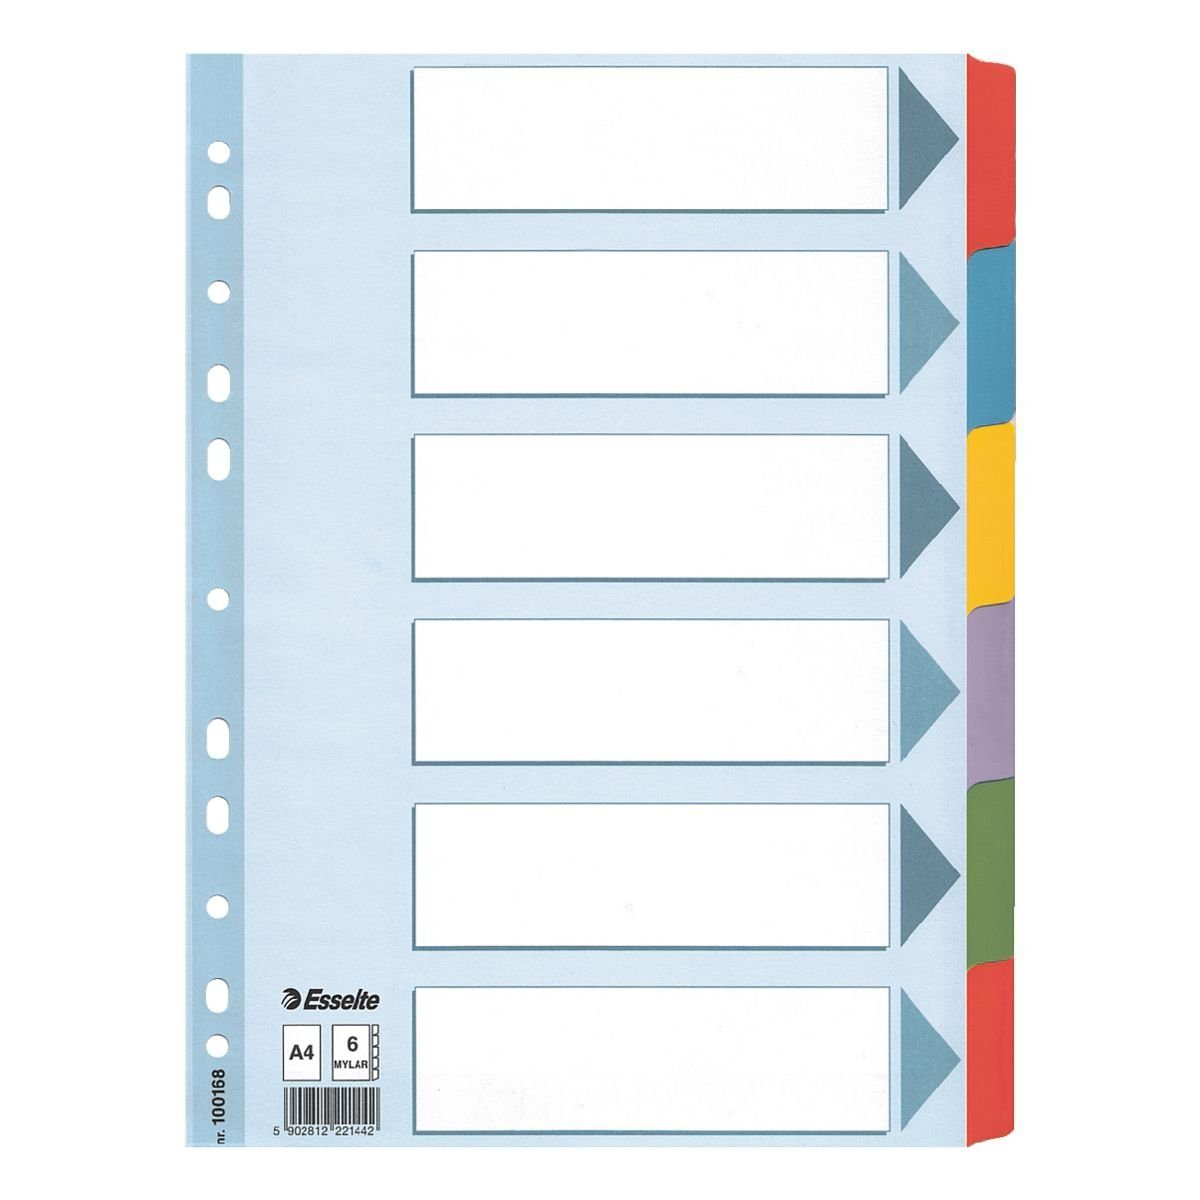 Esselte Kartonregister 6-teilig blanko farbige Taben A4 weiß